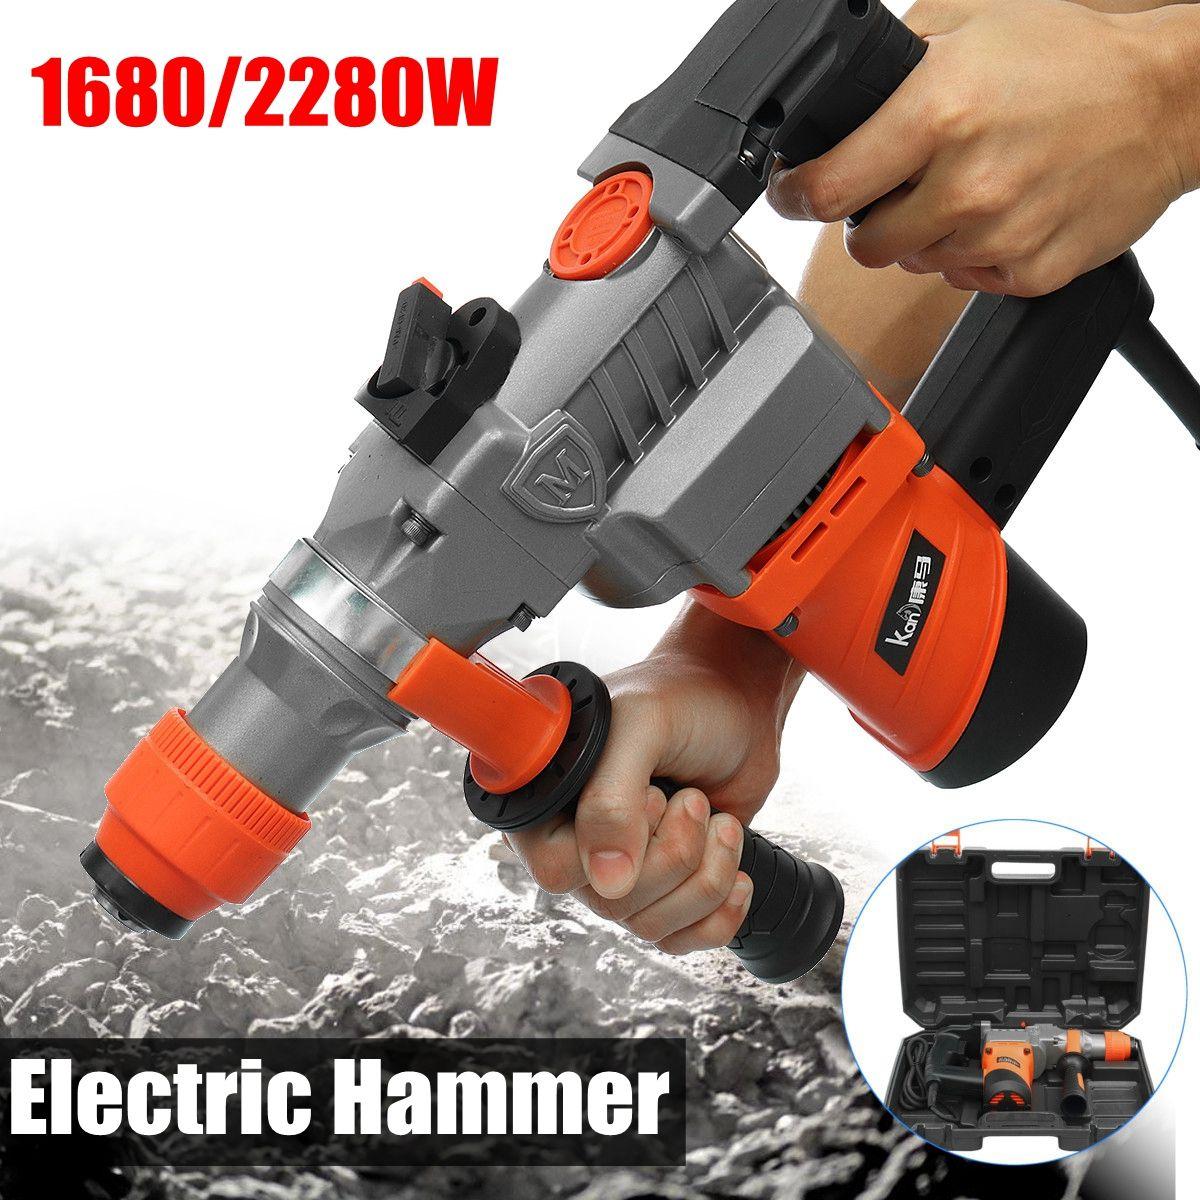 1680/2280W Watt 4500bpm Electric Demolition Jack Hammer Concrete Breaker Punch Metal Box